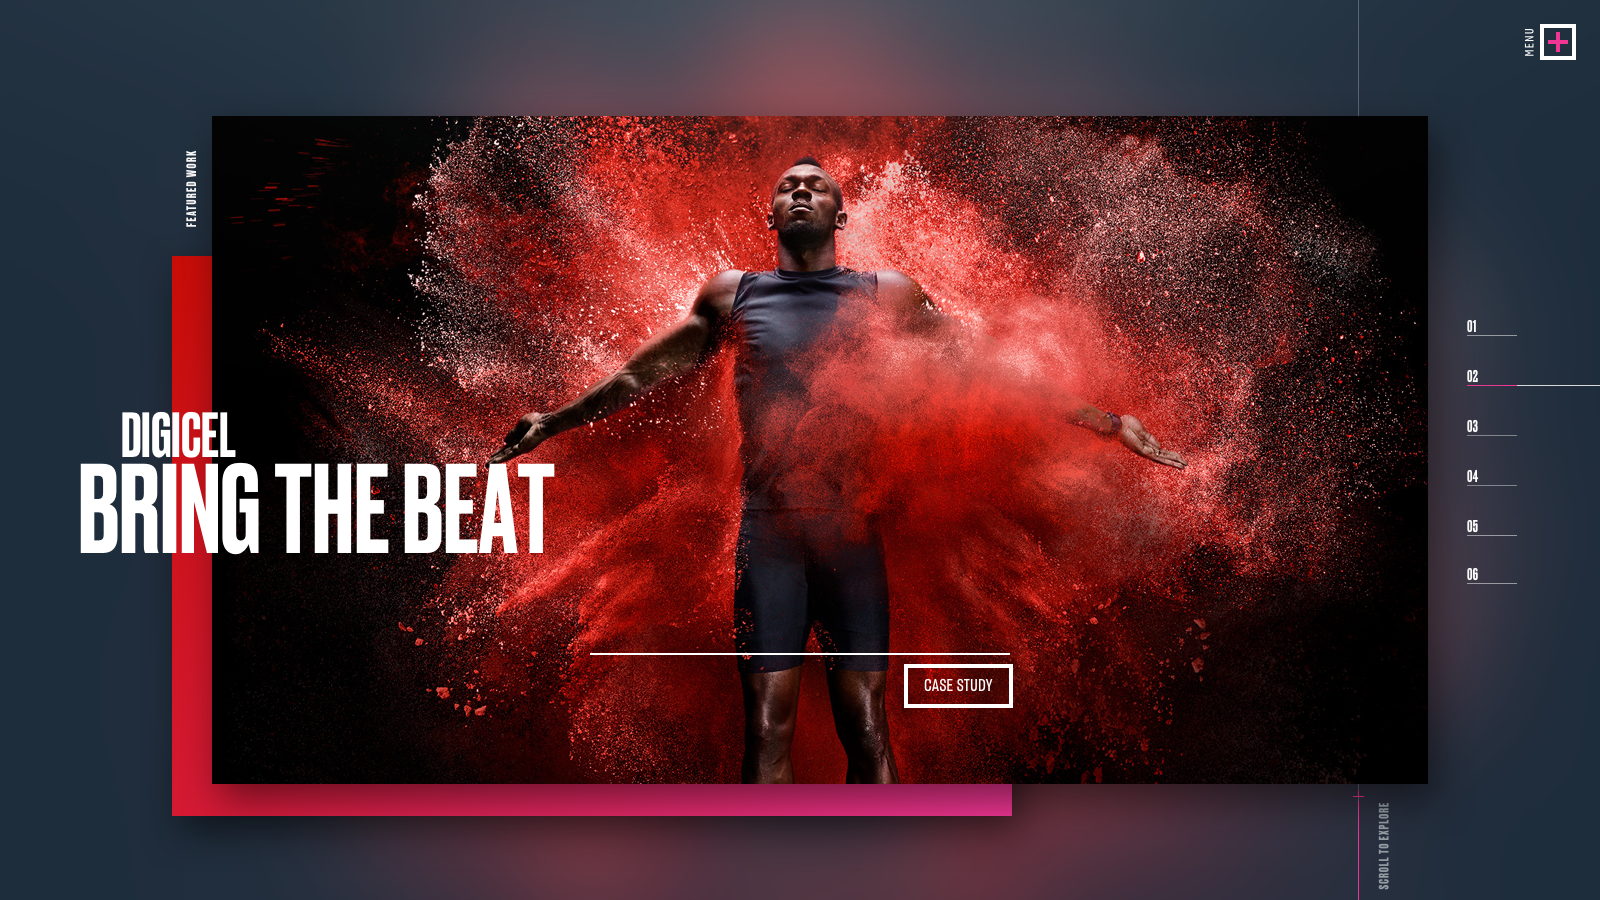 Desktop bring the beat